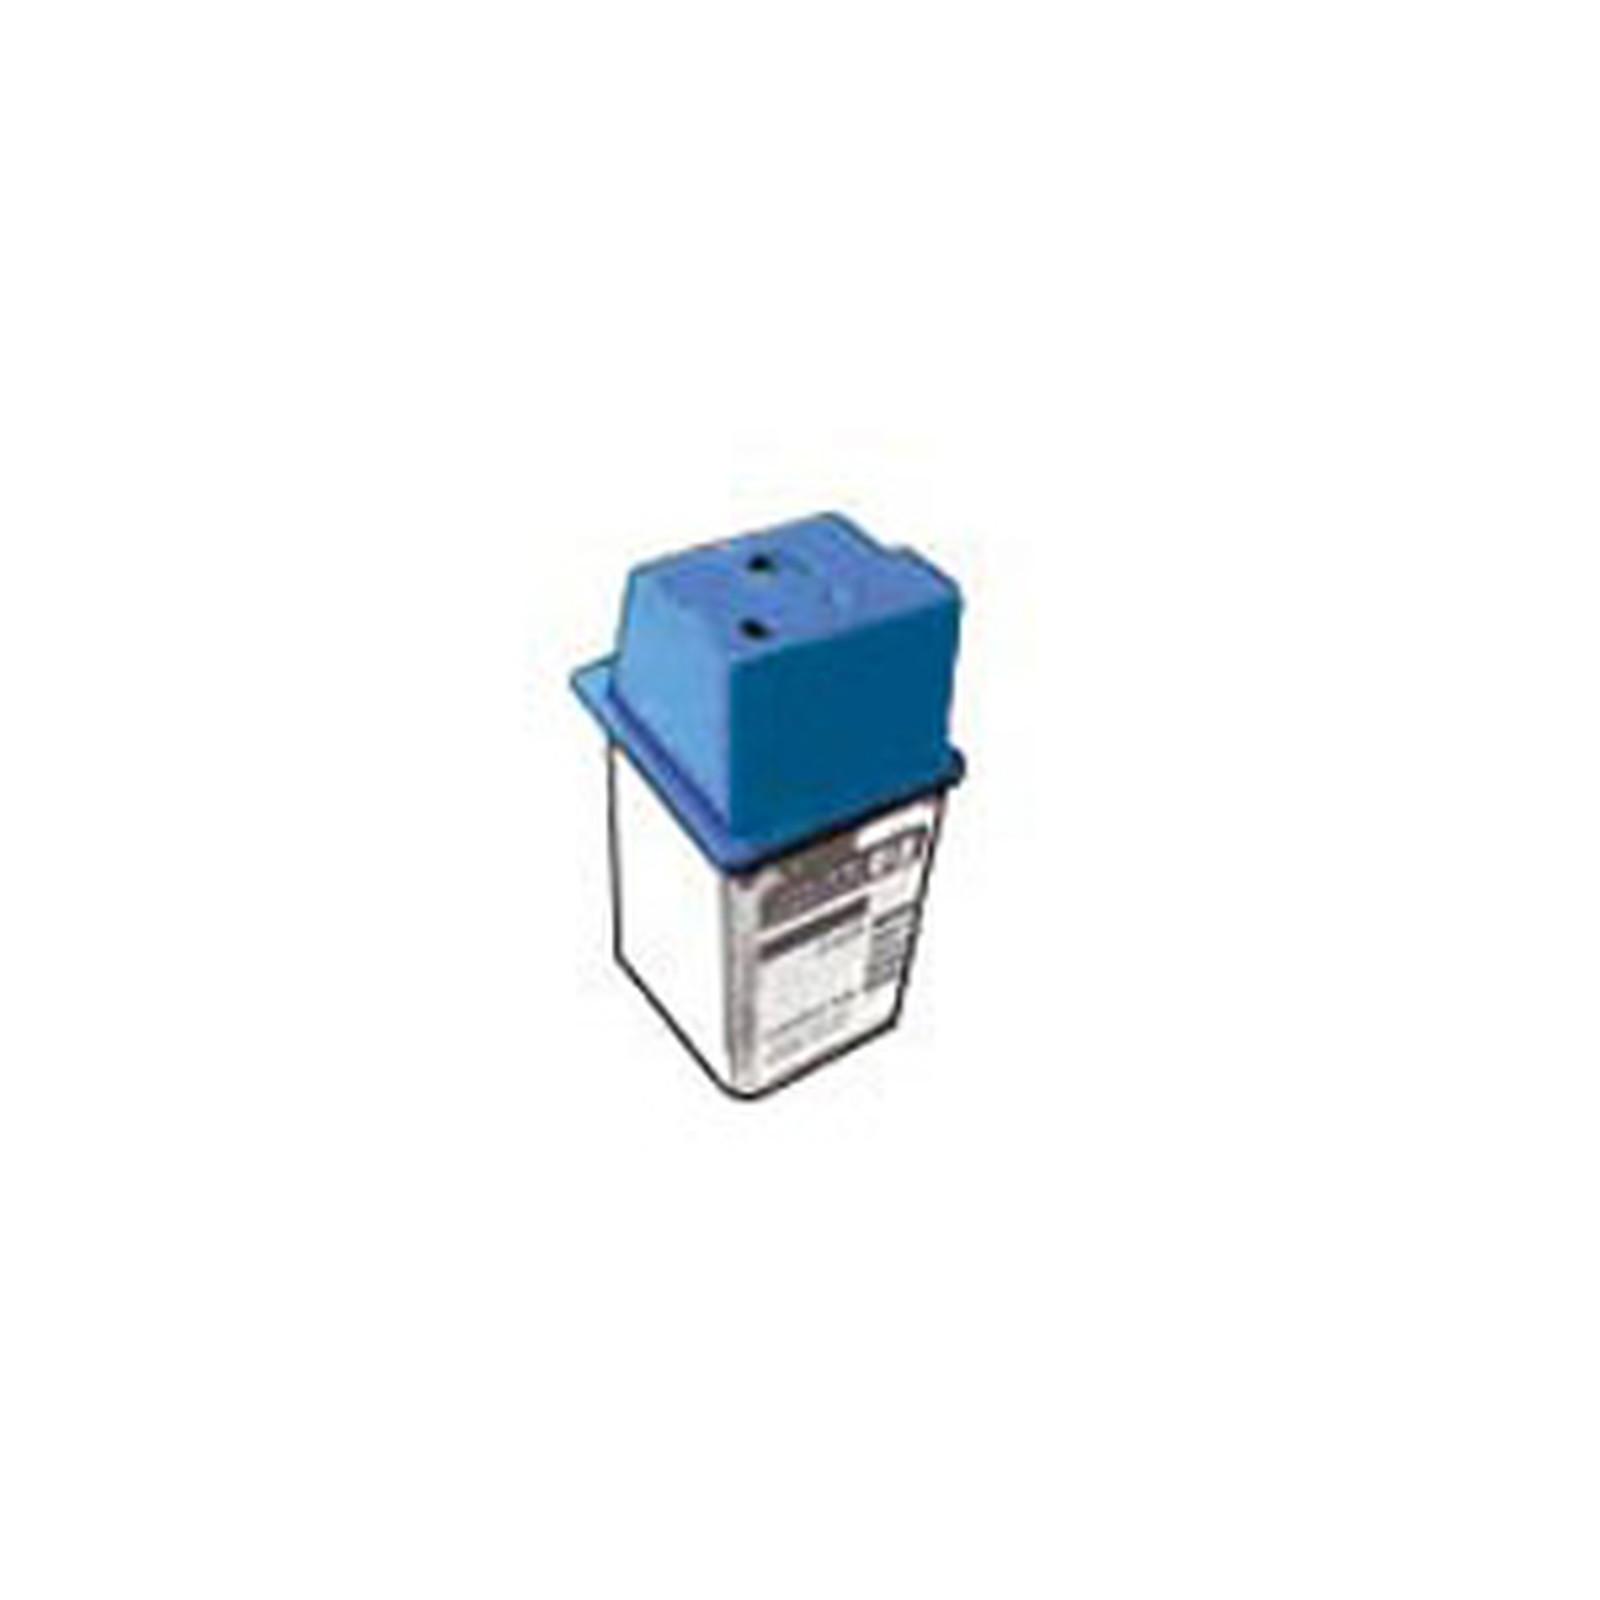 Cartouche compatible Epson Stylus Photo R240/RX520 (Cyan)